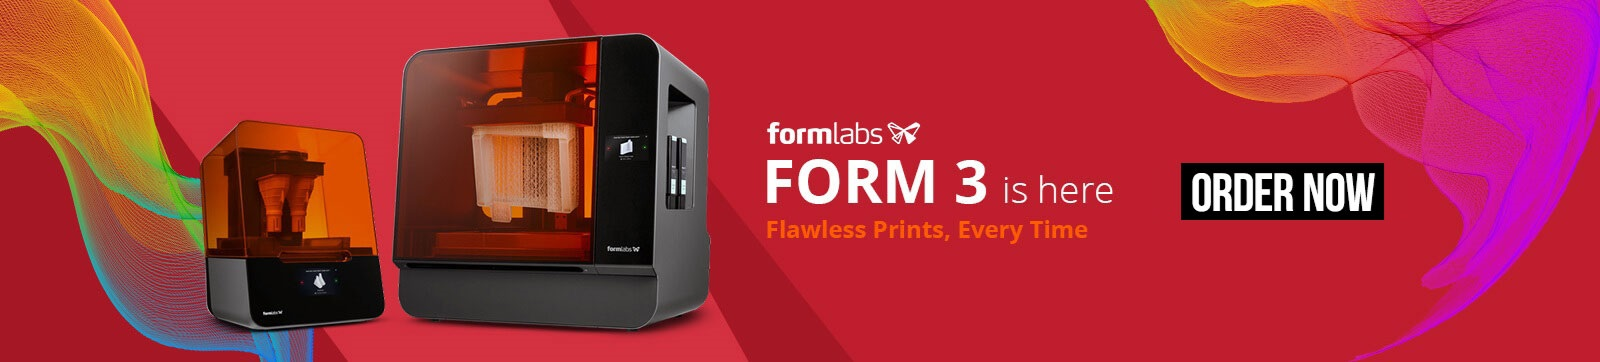 Formlabs - Form 3 & 3L